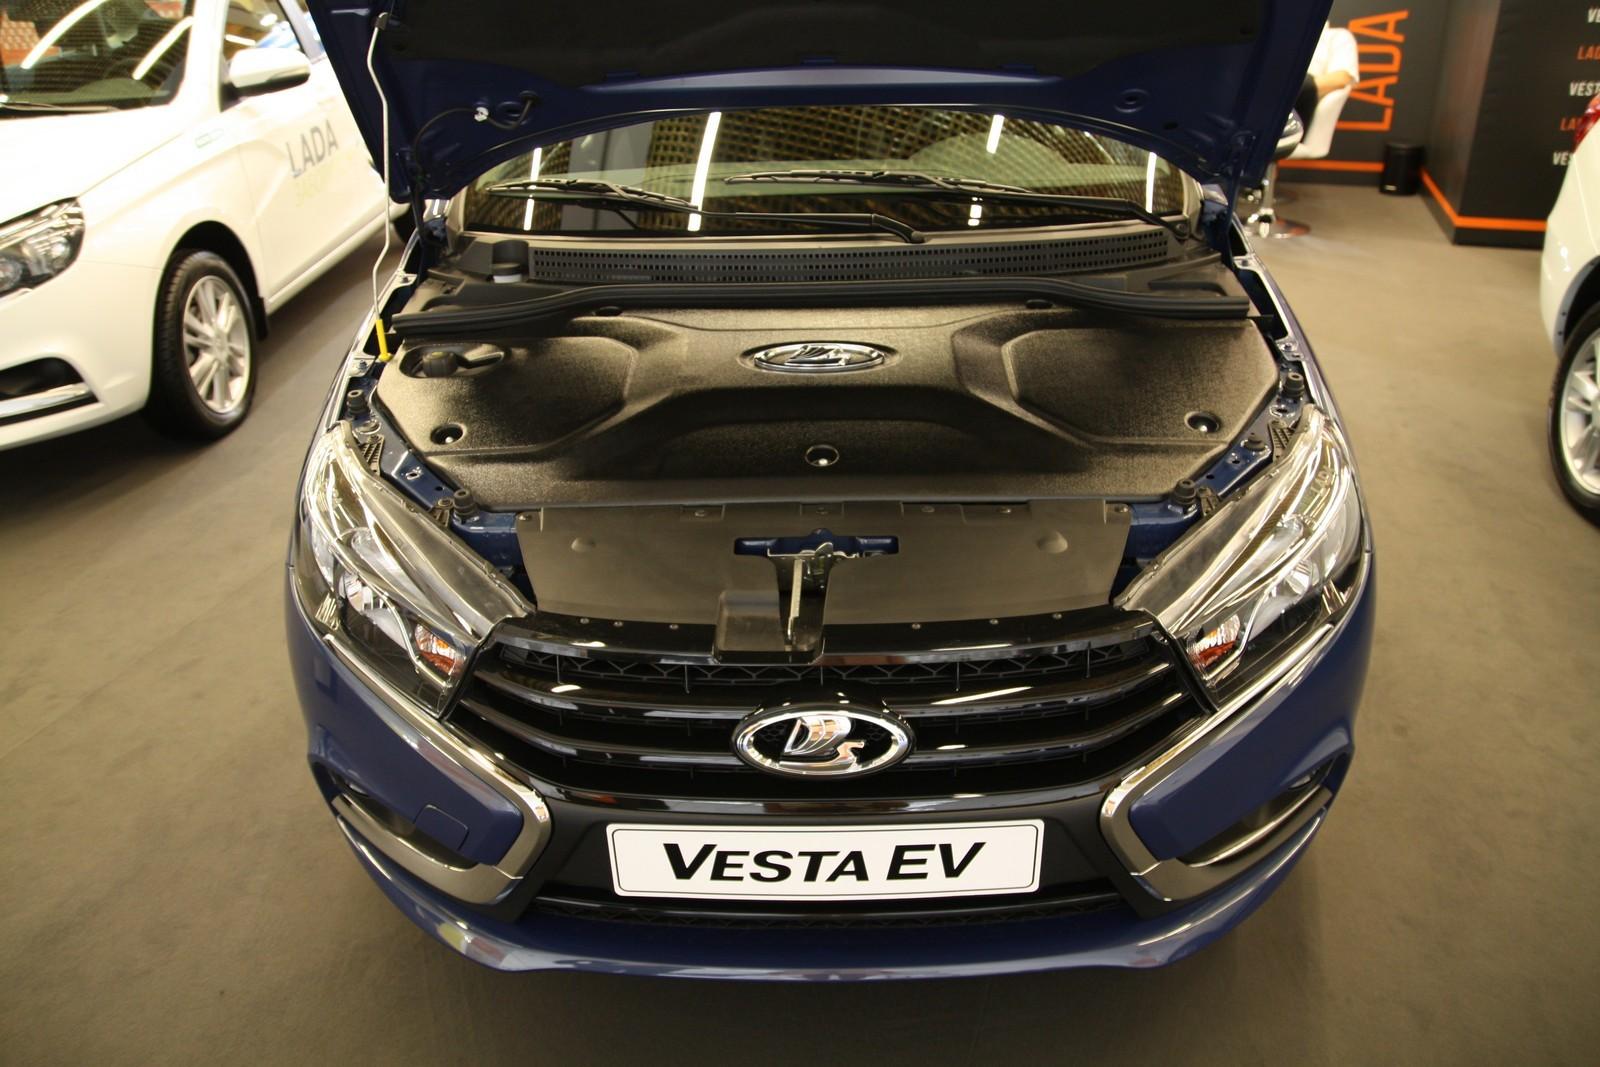 Новая забава – сборка электромобилей на АвтоВАЗе